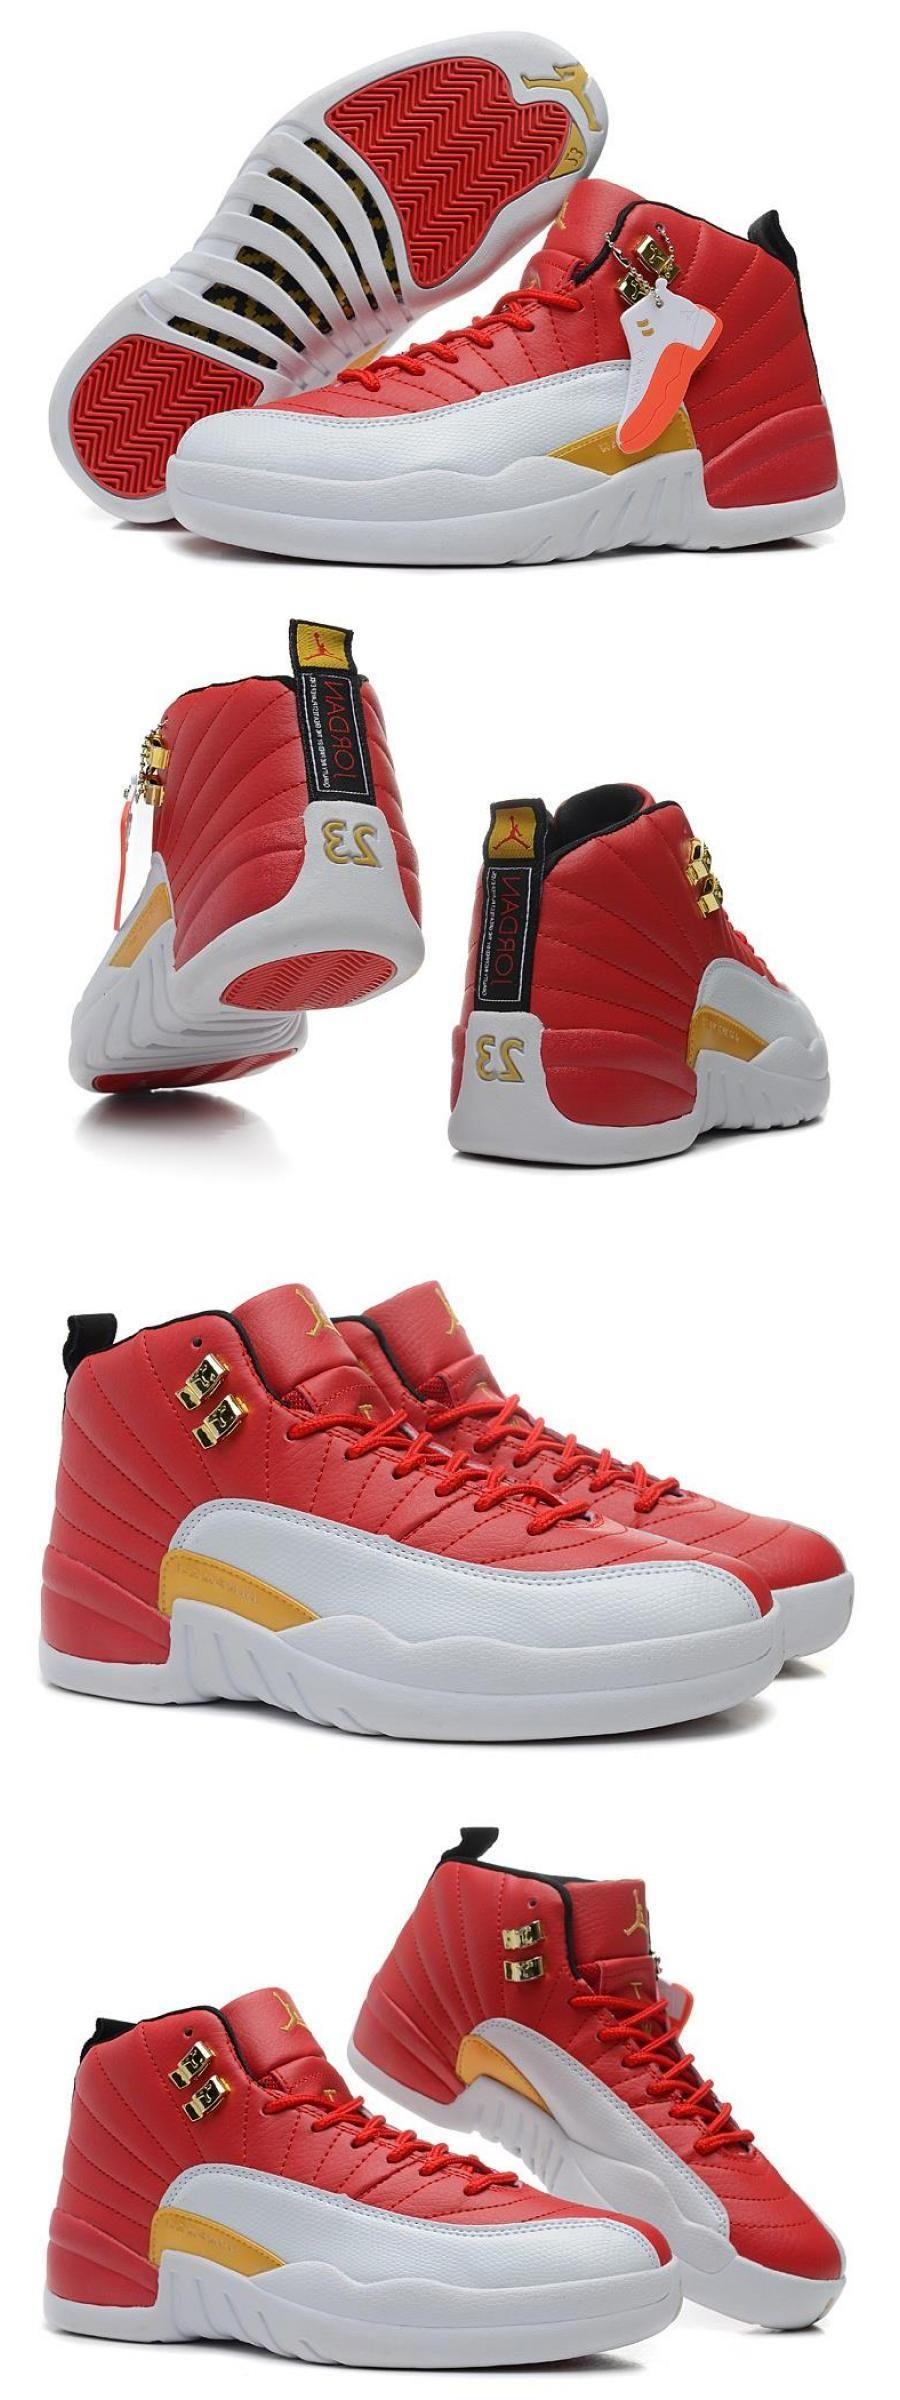 Air Jordan 12 Gs Cherry Red White in 2020